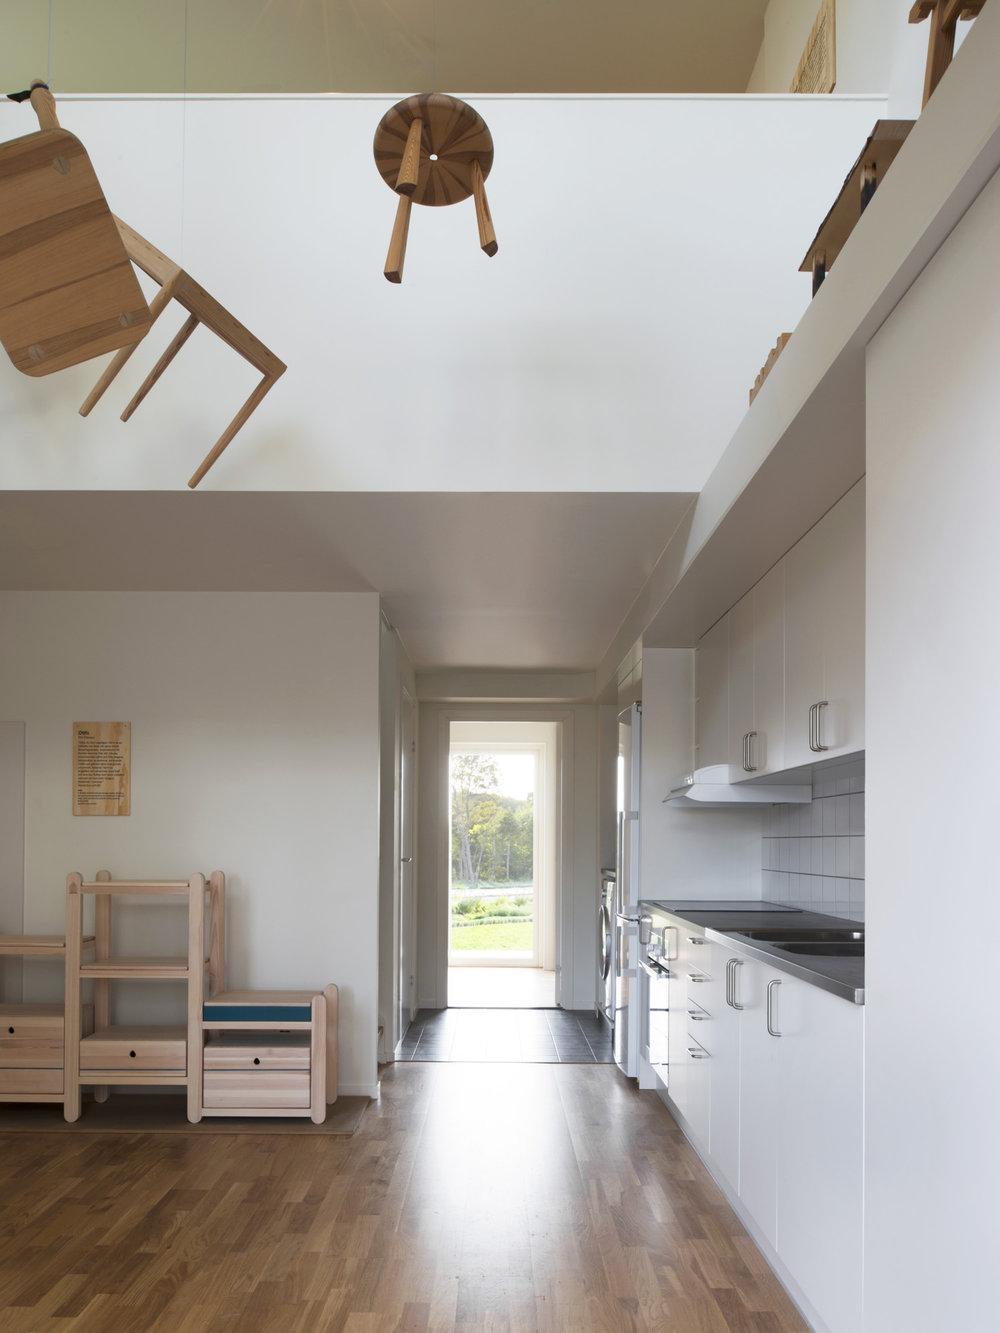 Traloftet-SPRIDD-©MikaelOlsson4290b-2.jpg